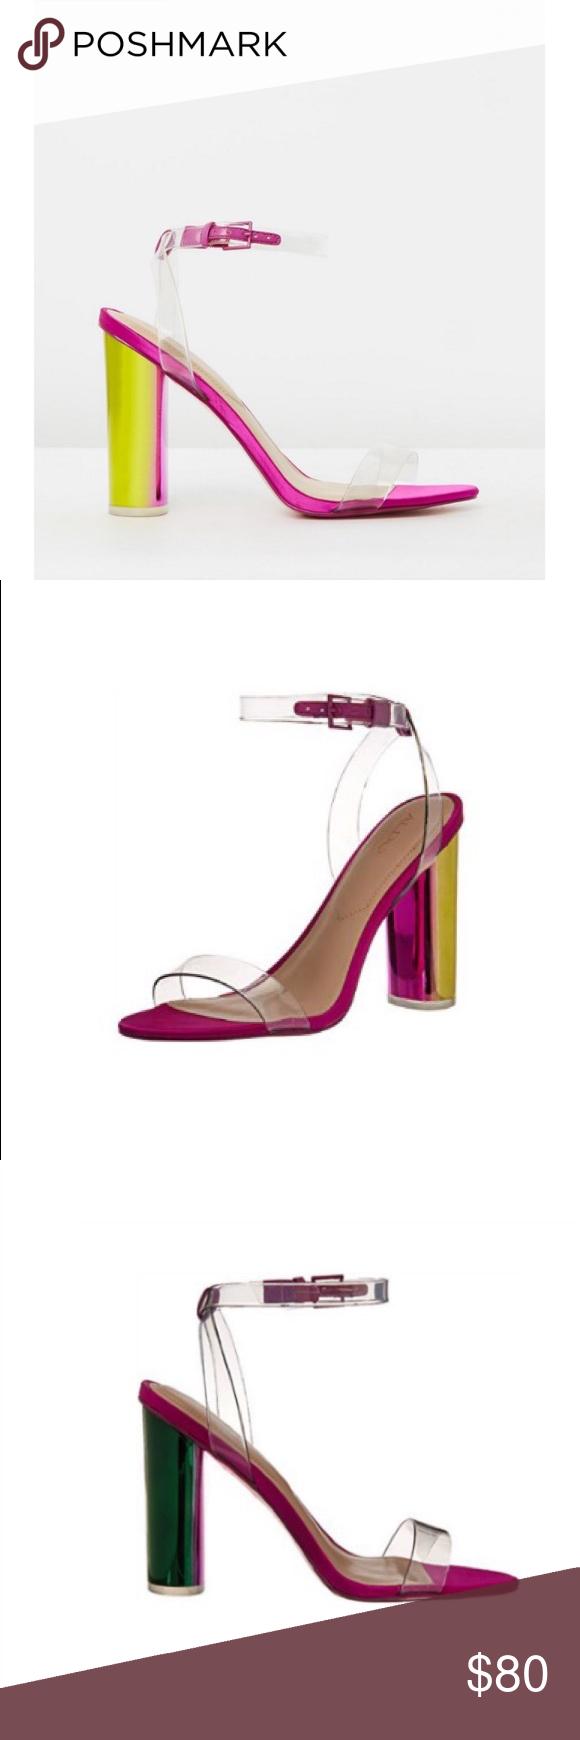 12ba62d2ff ✨ALDO✨Astareni Transparent Fuschia Sandals ALDO Astareni Transparent  Fuschia Sandals •Size 8.5 •97% Polyurethane, 3% Metal •Rubber sole • Heeled  Sandal ...